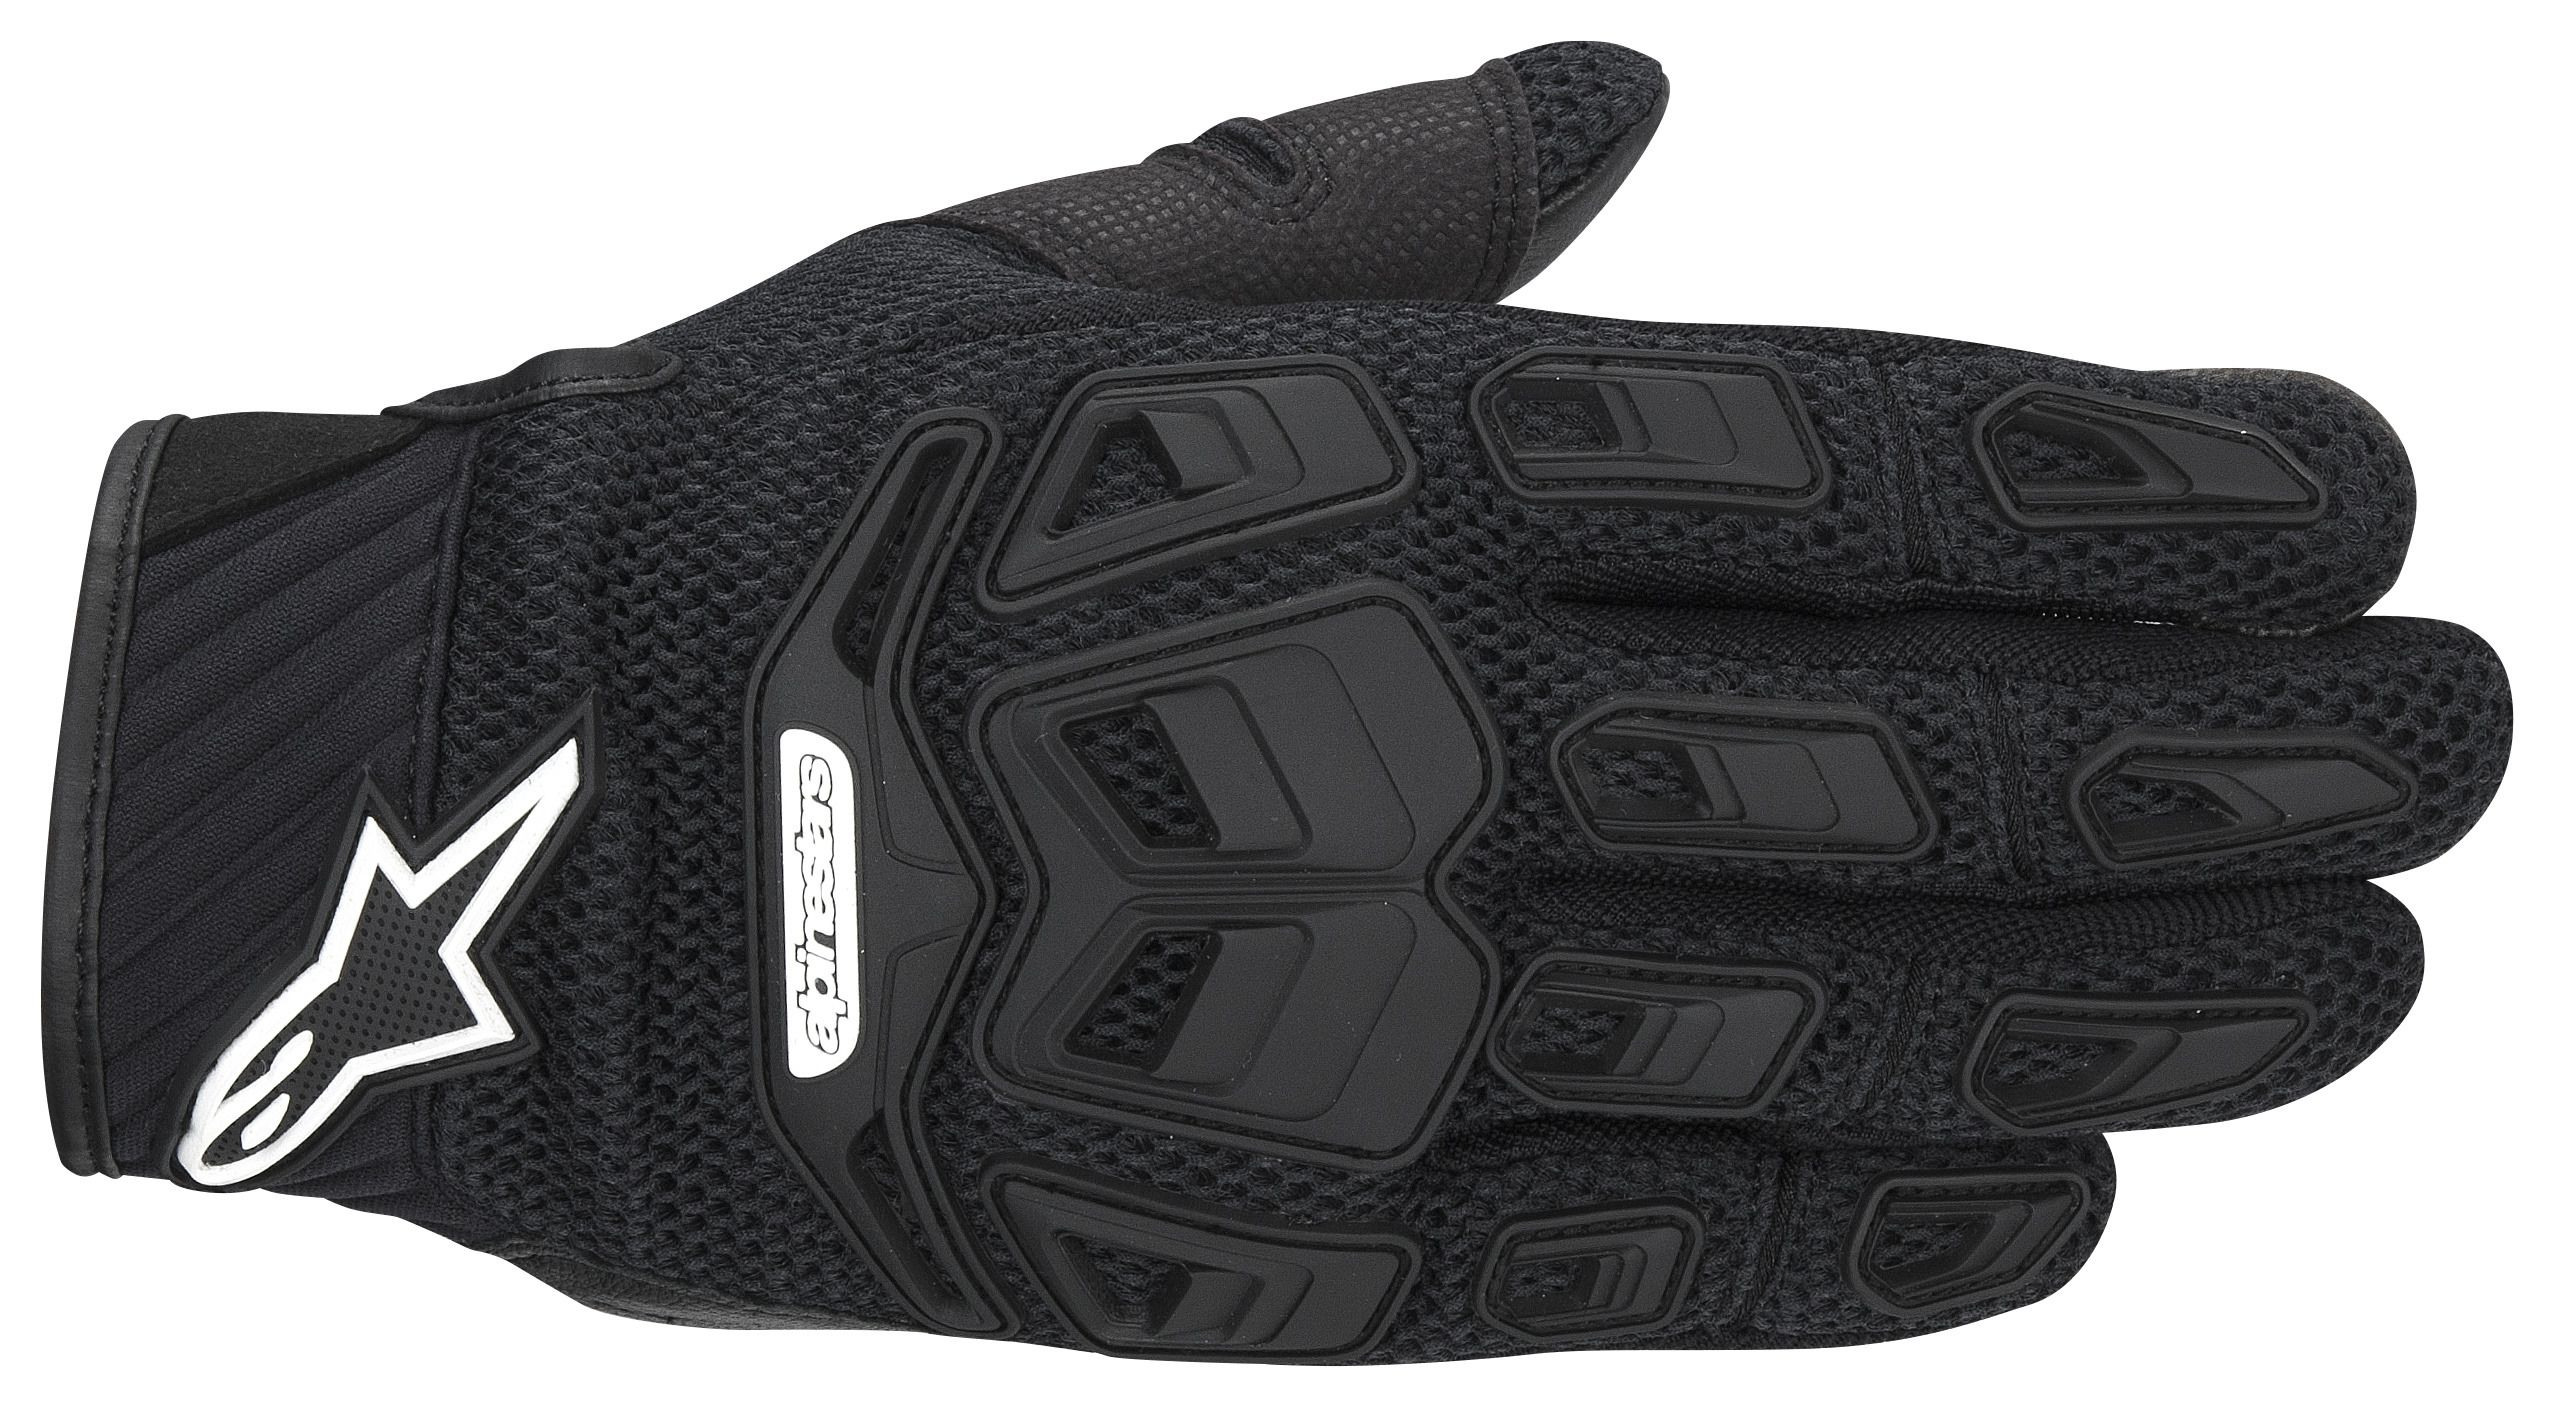 Motorcycle gloves thin - Motorcycle Gloves Thin 21